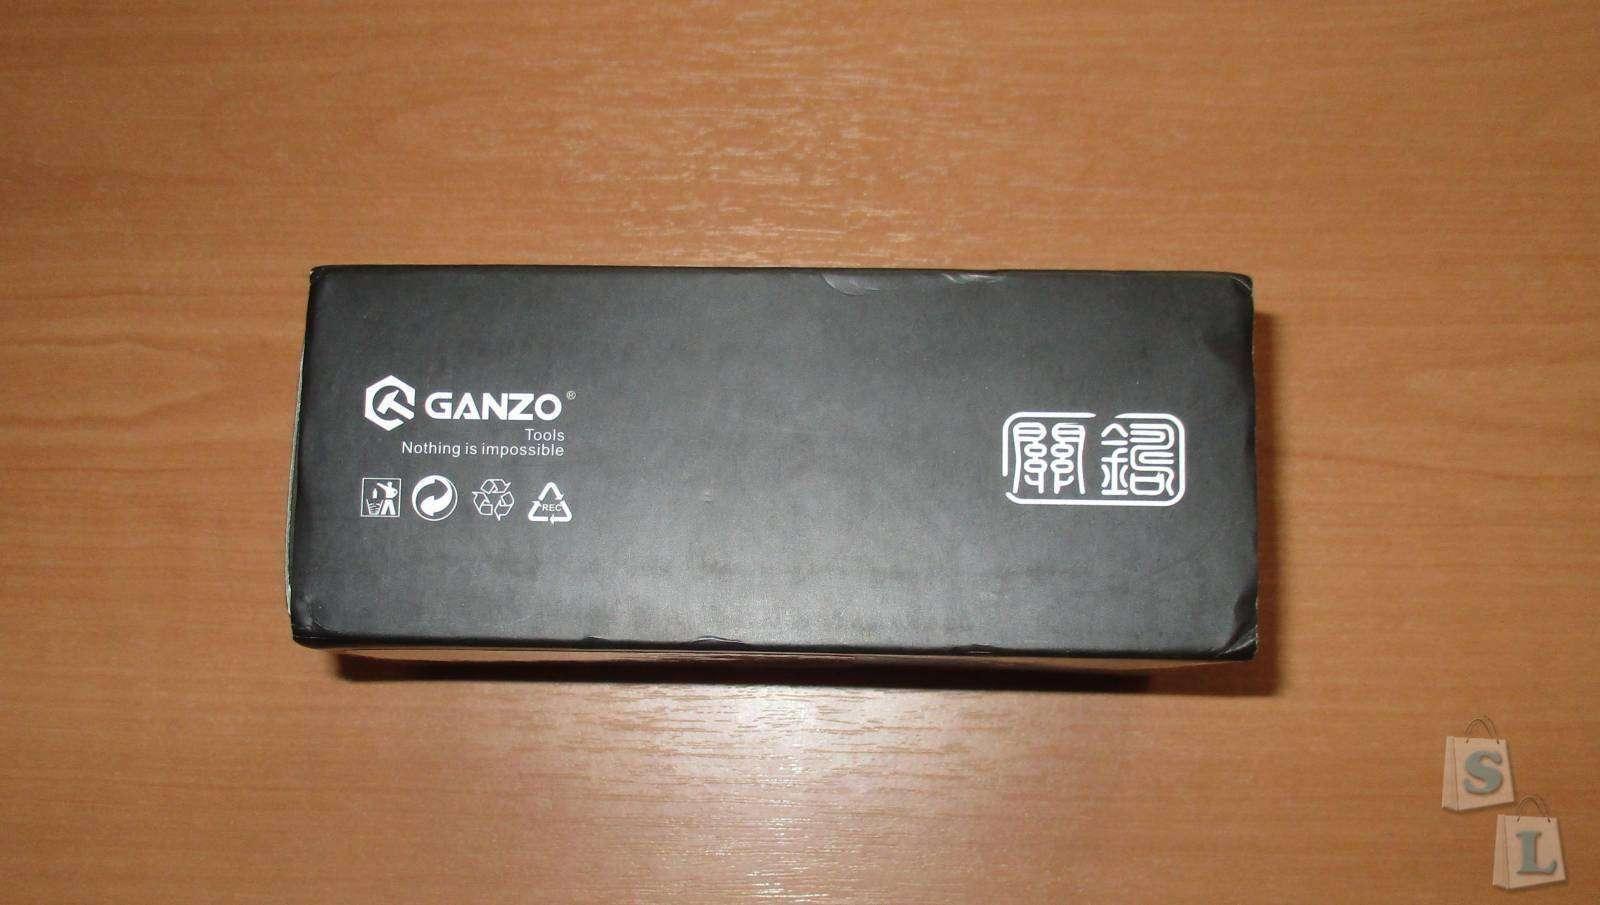 GearBest: Мультитул Ganzo G302-H. Хромированное продолжение серии G302.